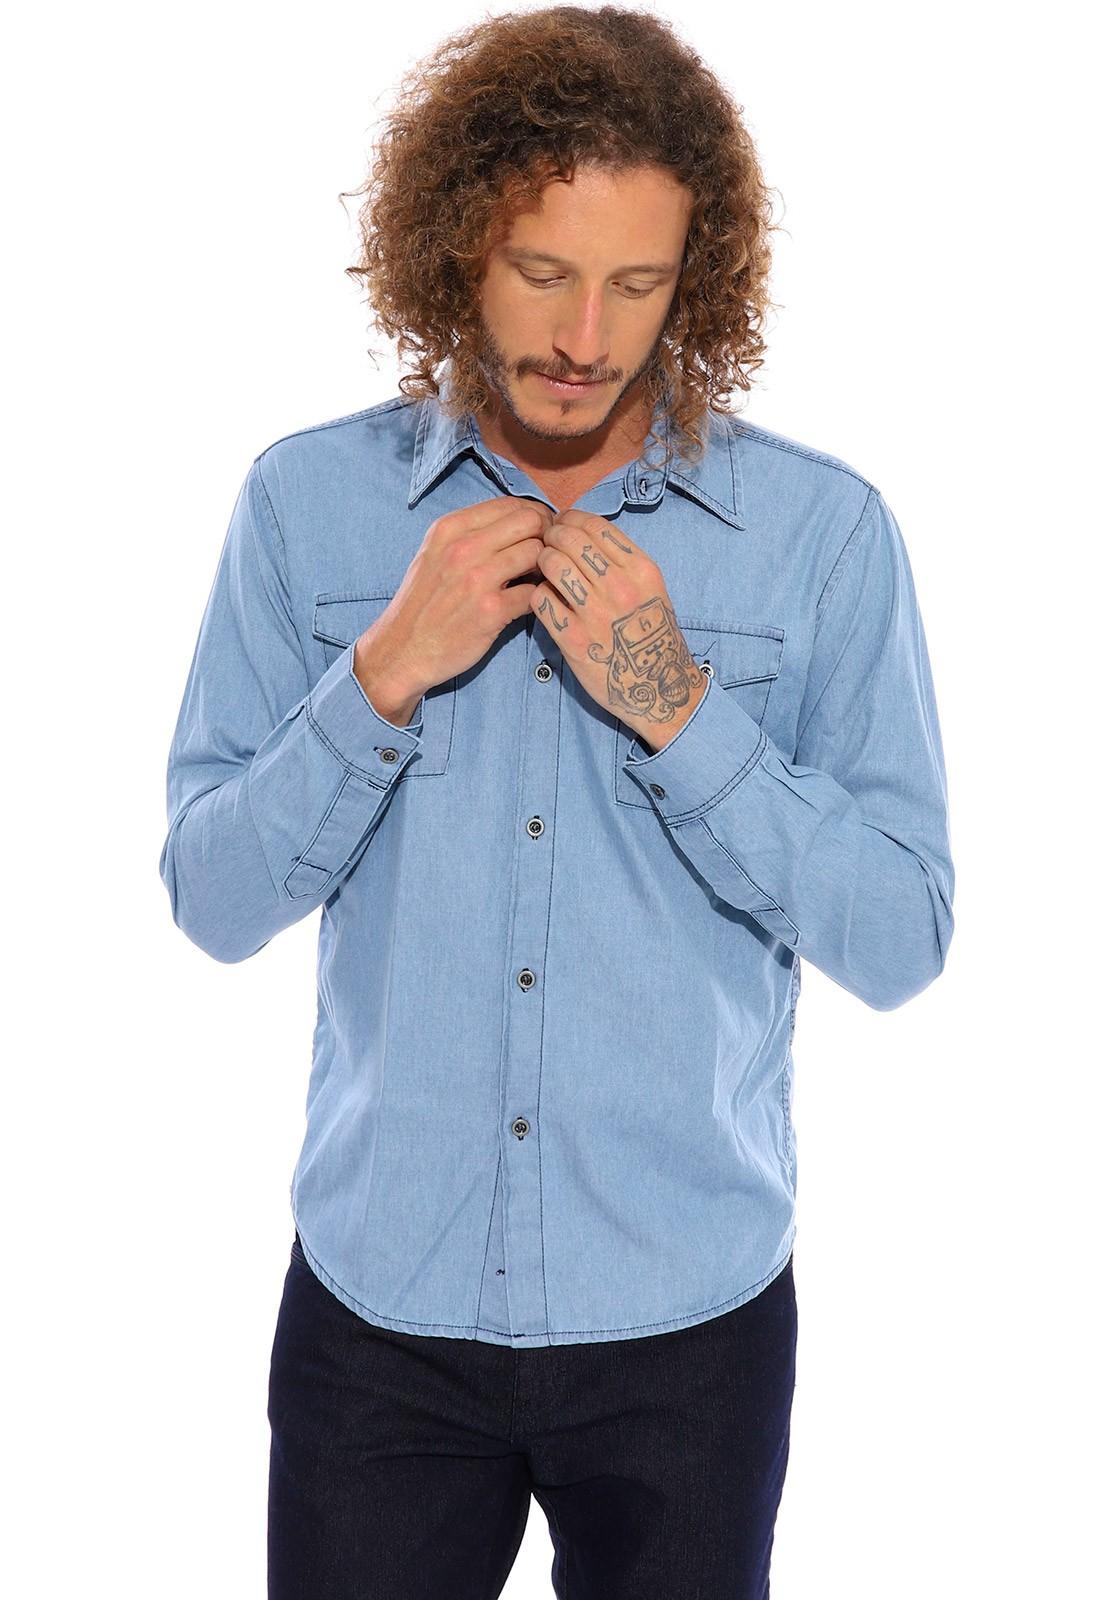 Camisa Jeans Vida Marinha Manga Longa